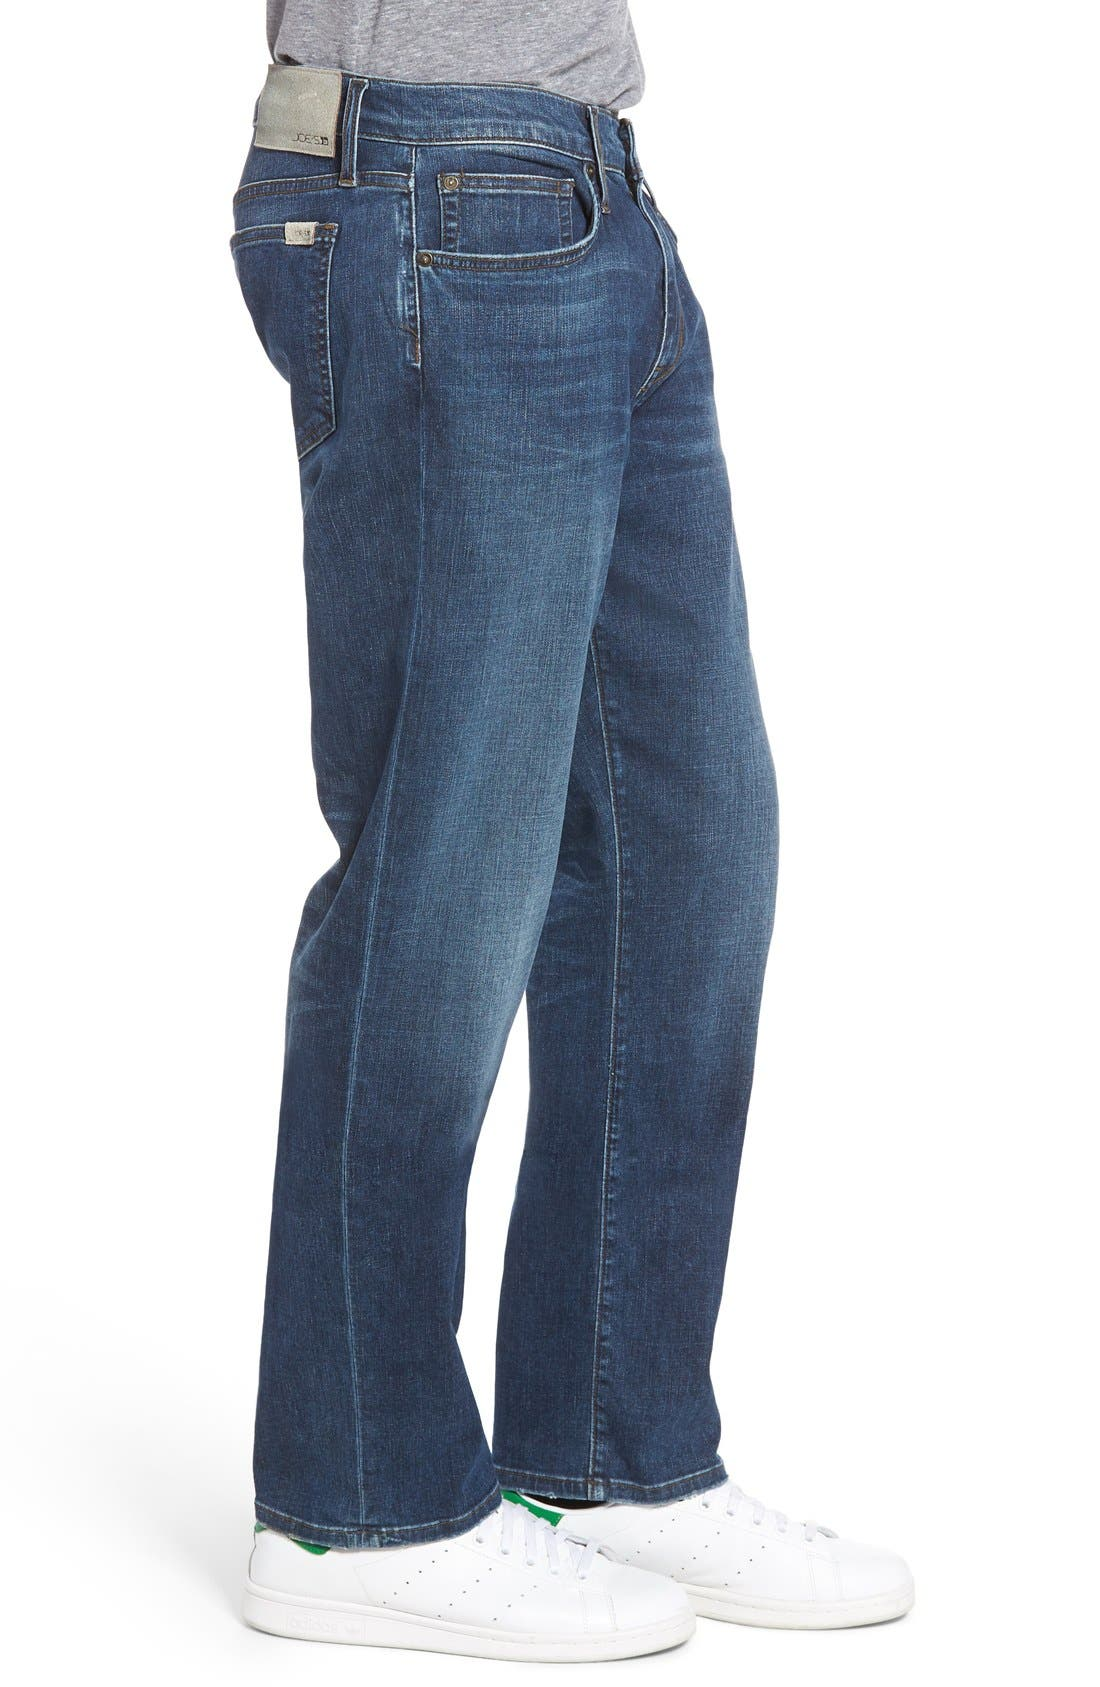 Alternate Image 3  - Joe's Brixton Slim Fit Jeans (Gladwin)